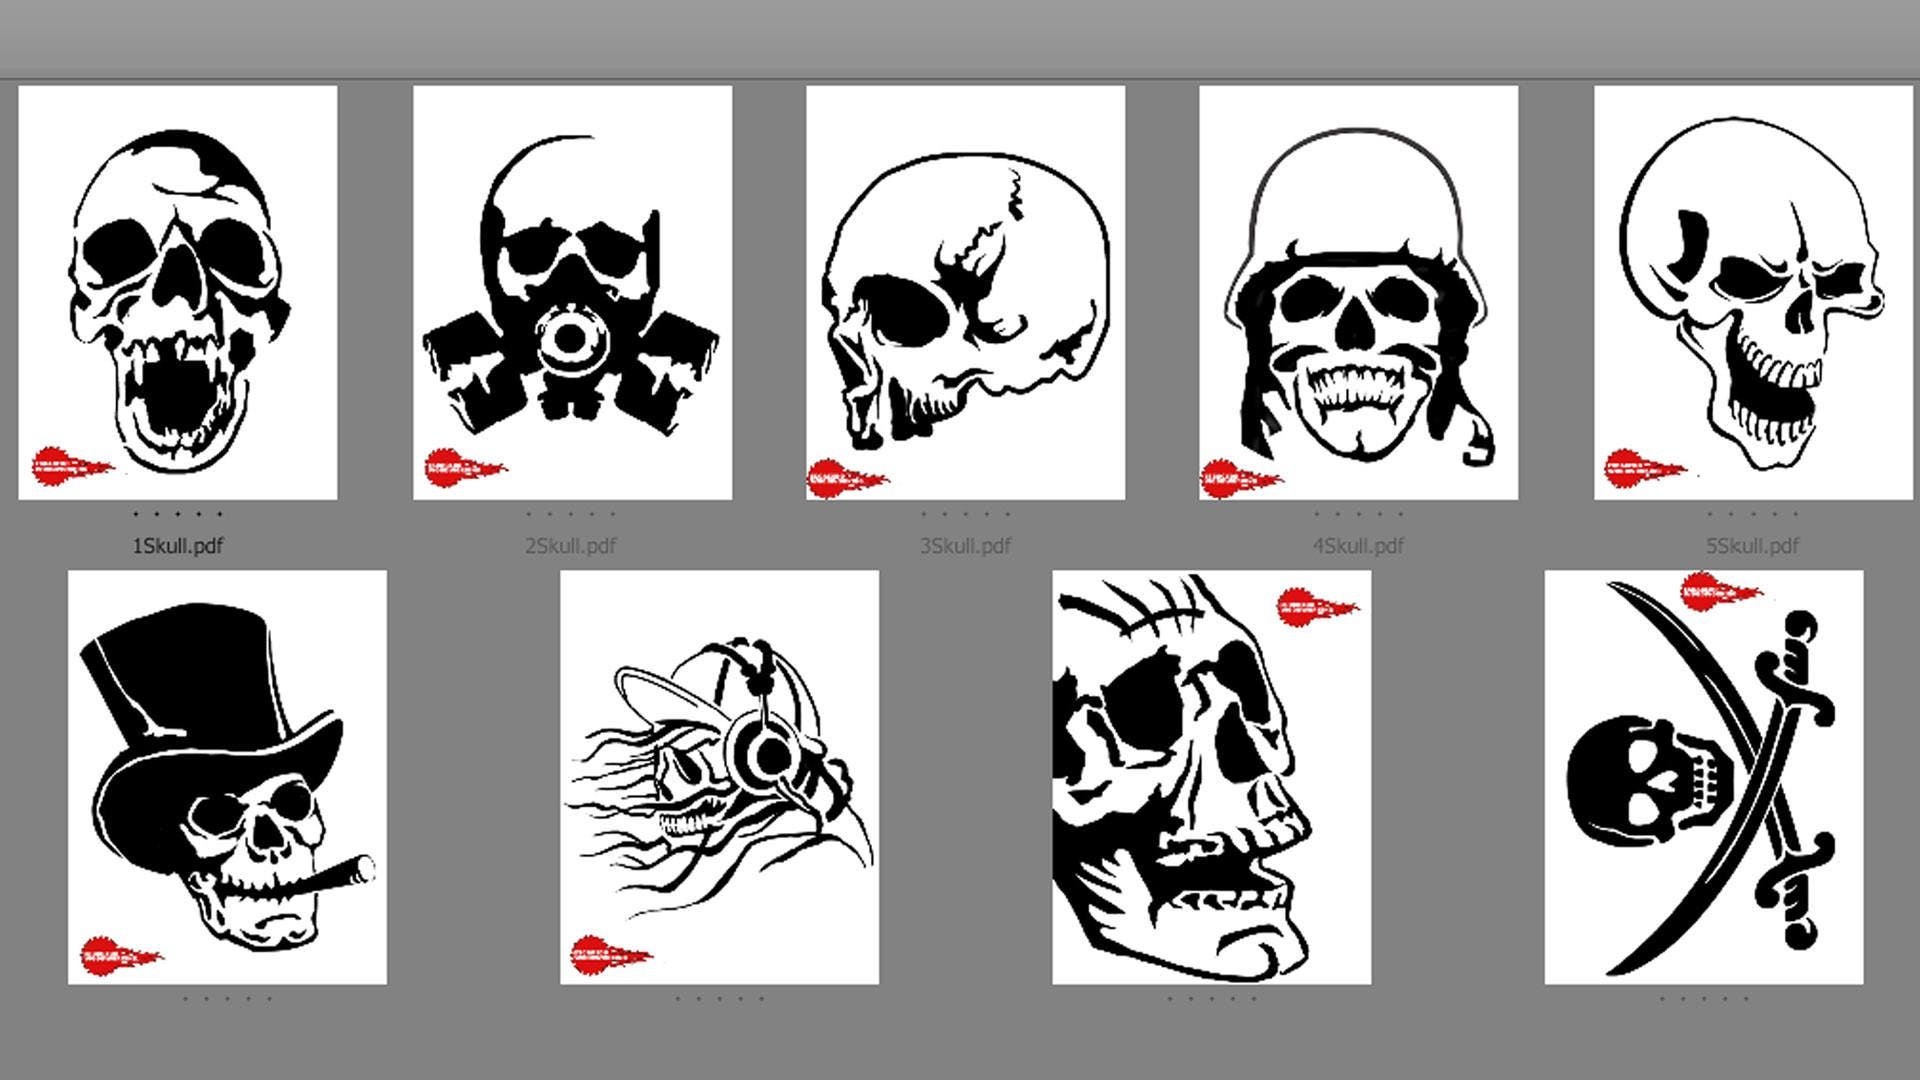 9 Skull Patterns Scroll Saw Woodworking Stencils Crafts.